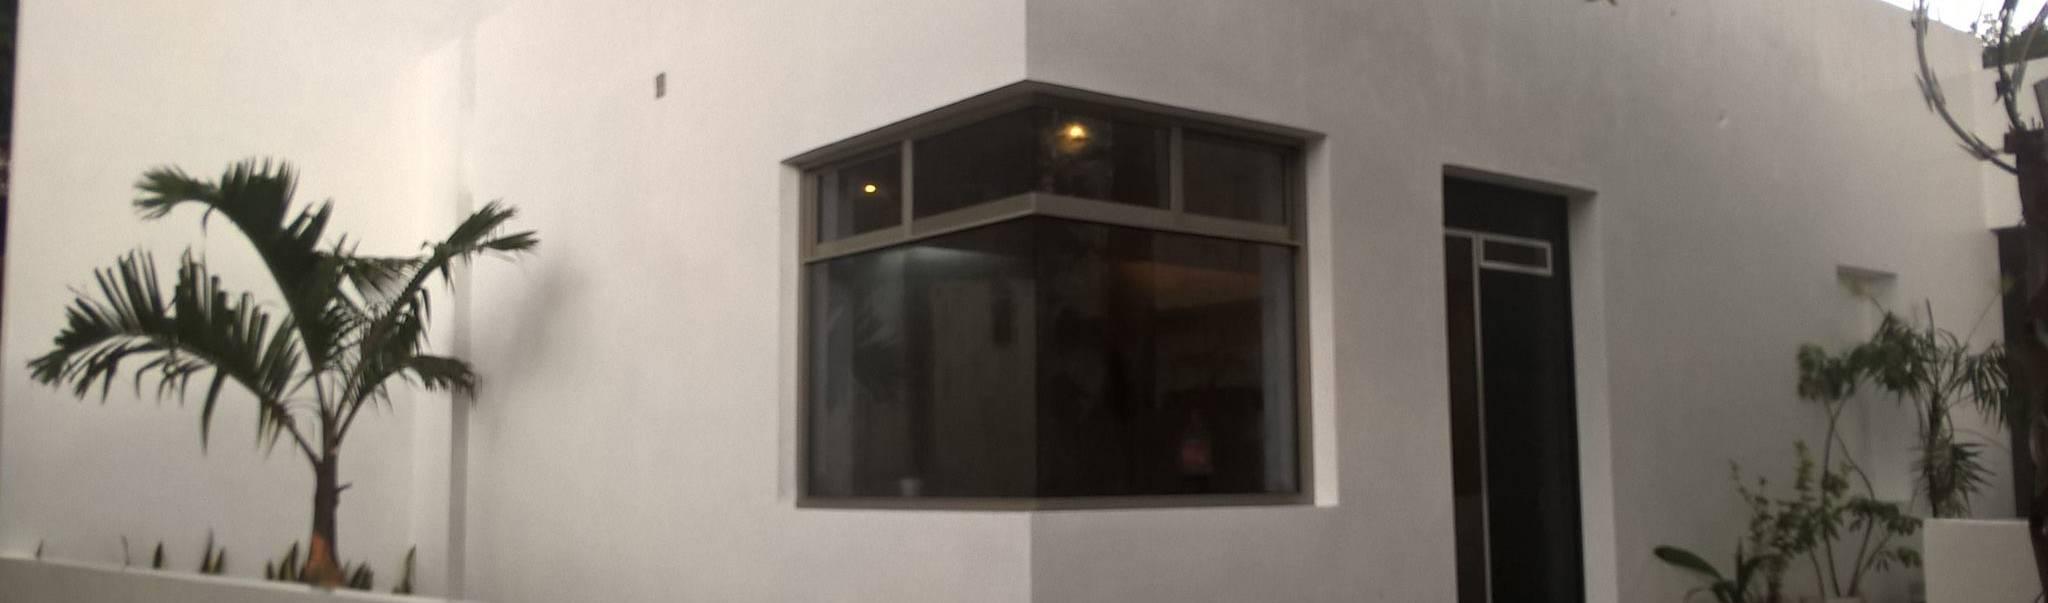 TALLER DE ARQUITECTURA SENSORIAL